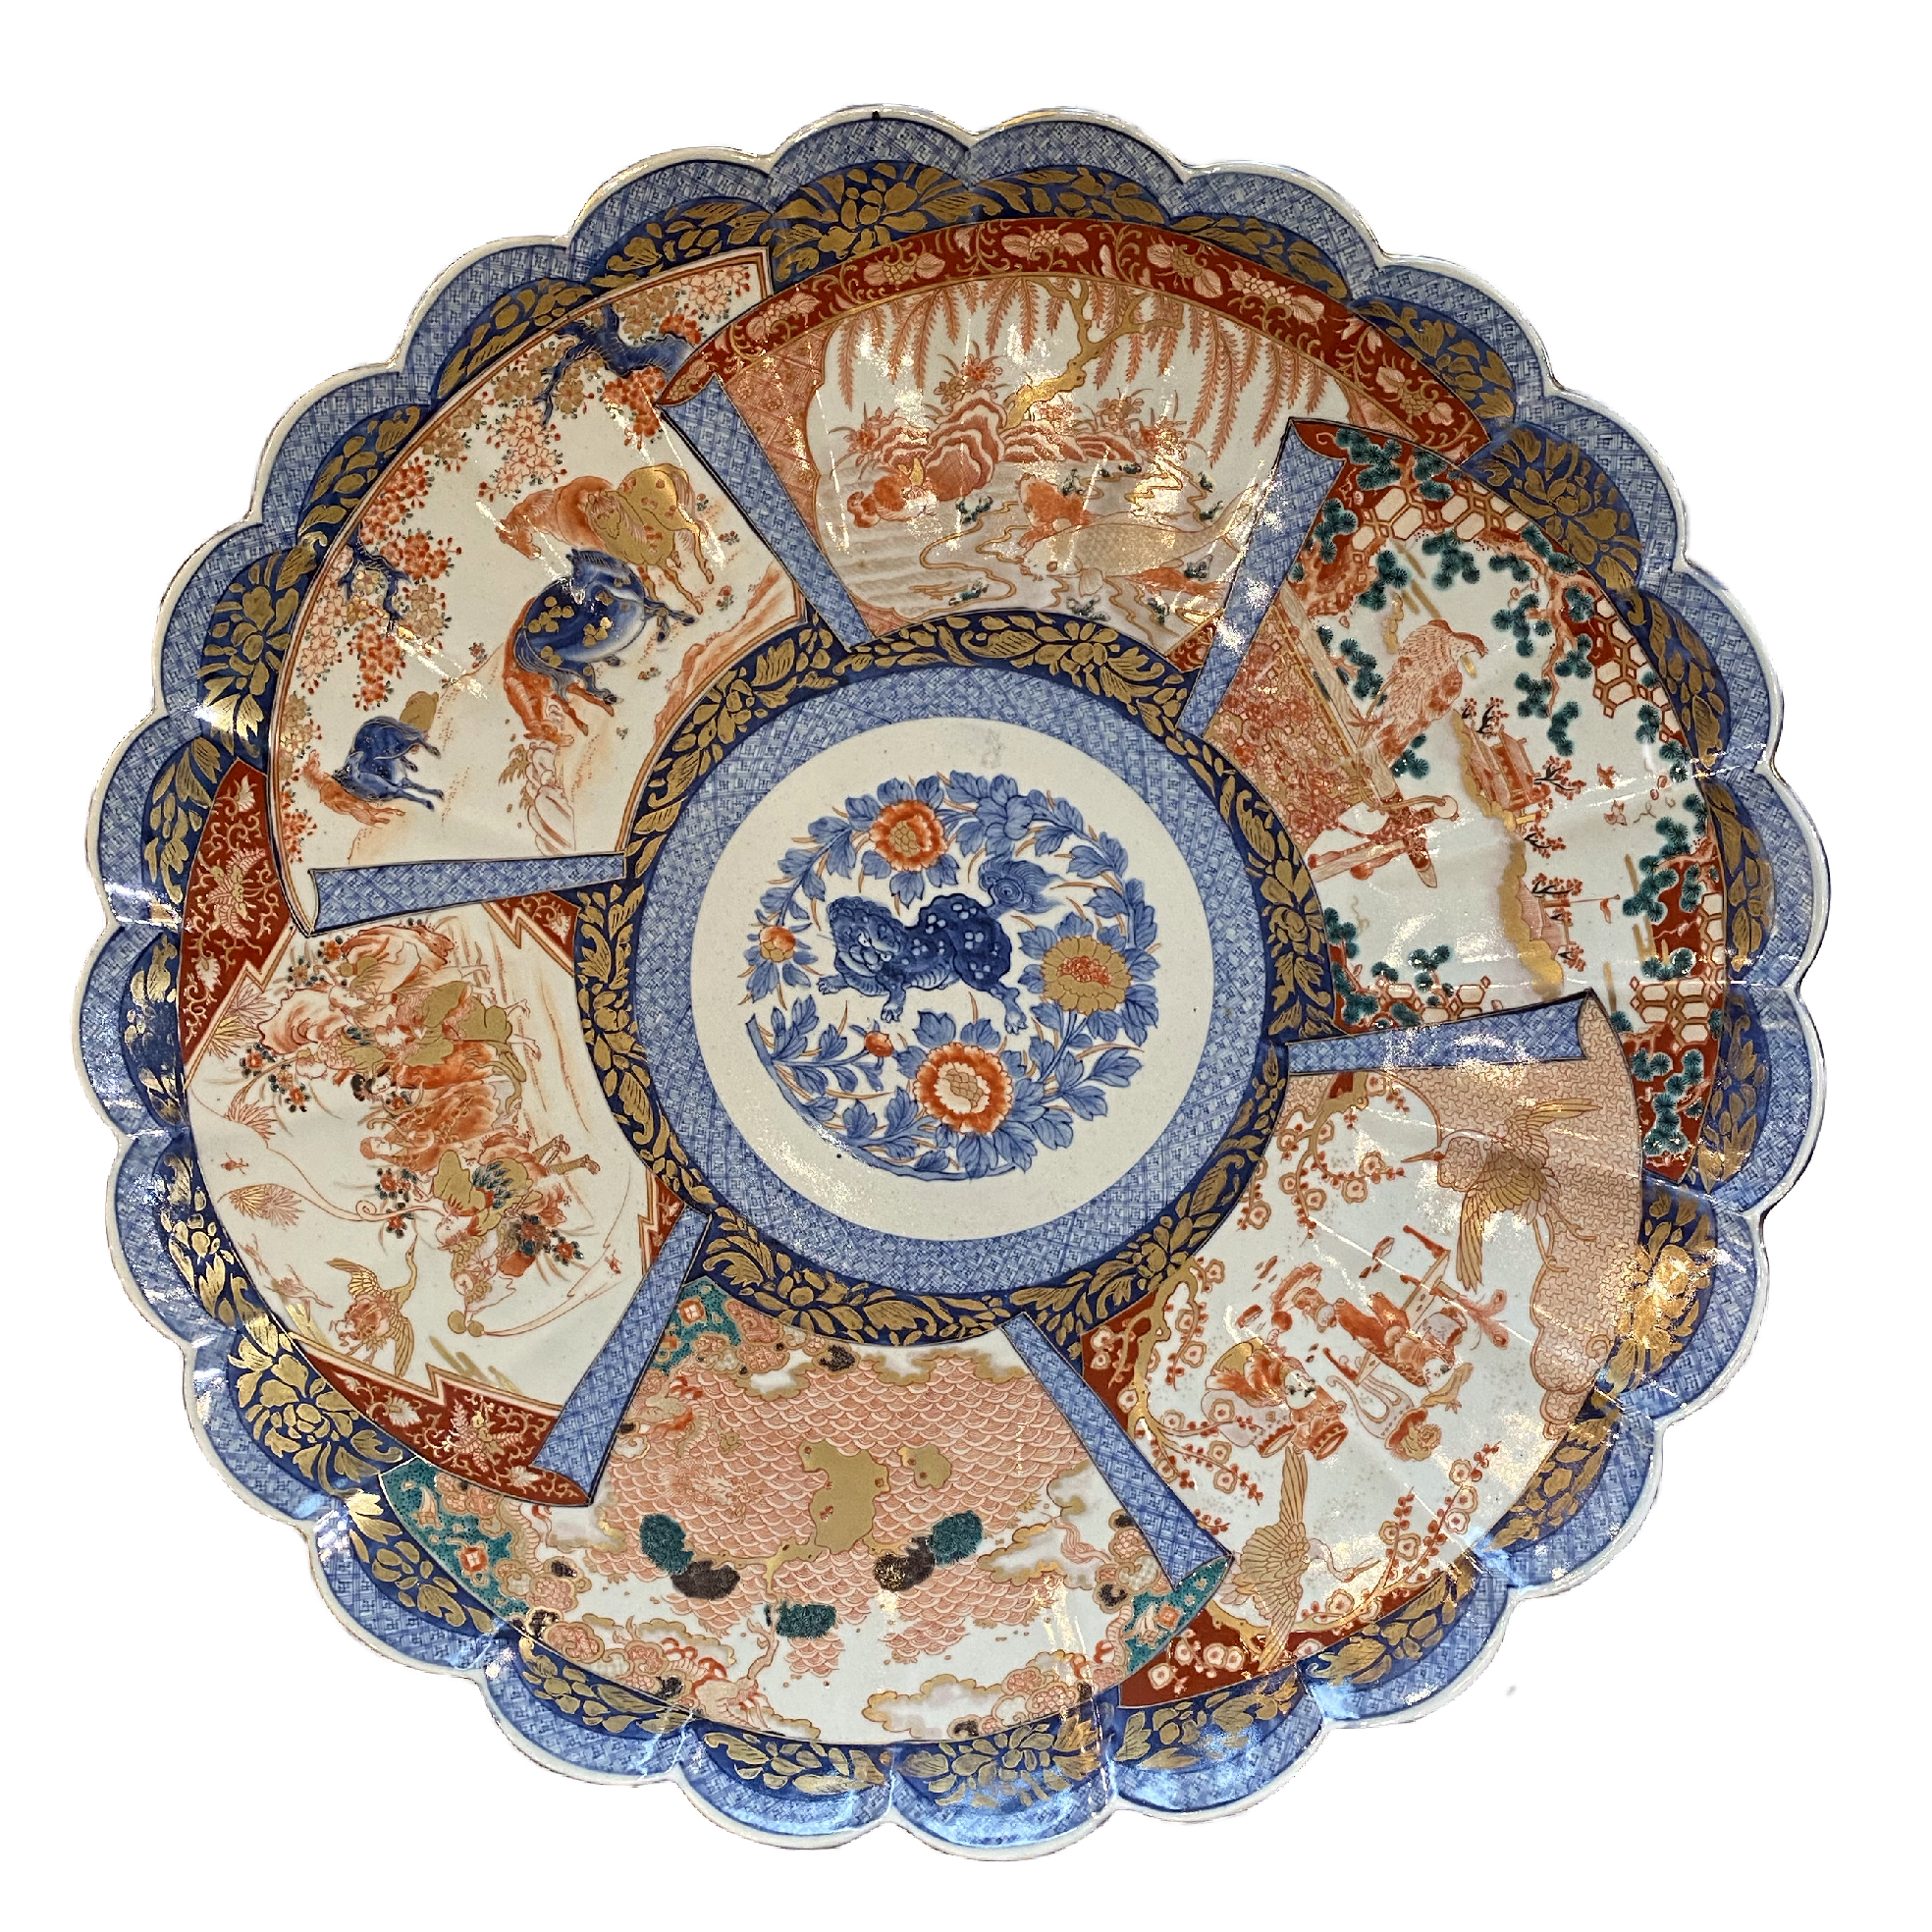 Japon, Arita, Très Grand plat Imari, époque Meiji., Grand plat Imari époque meiji